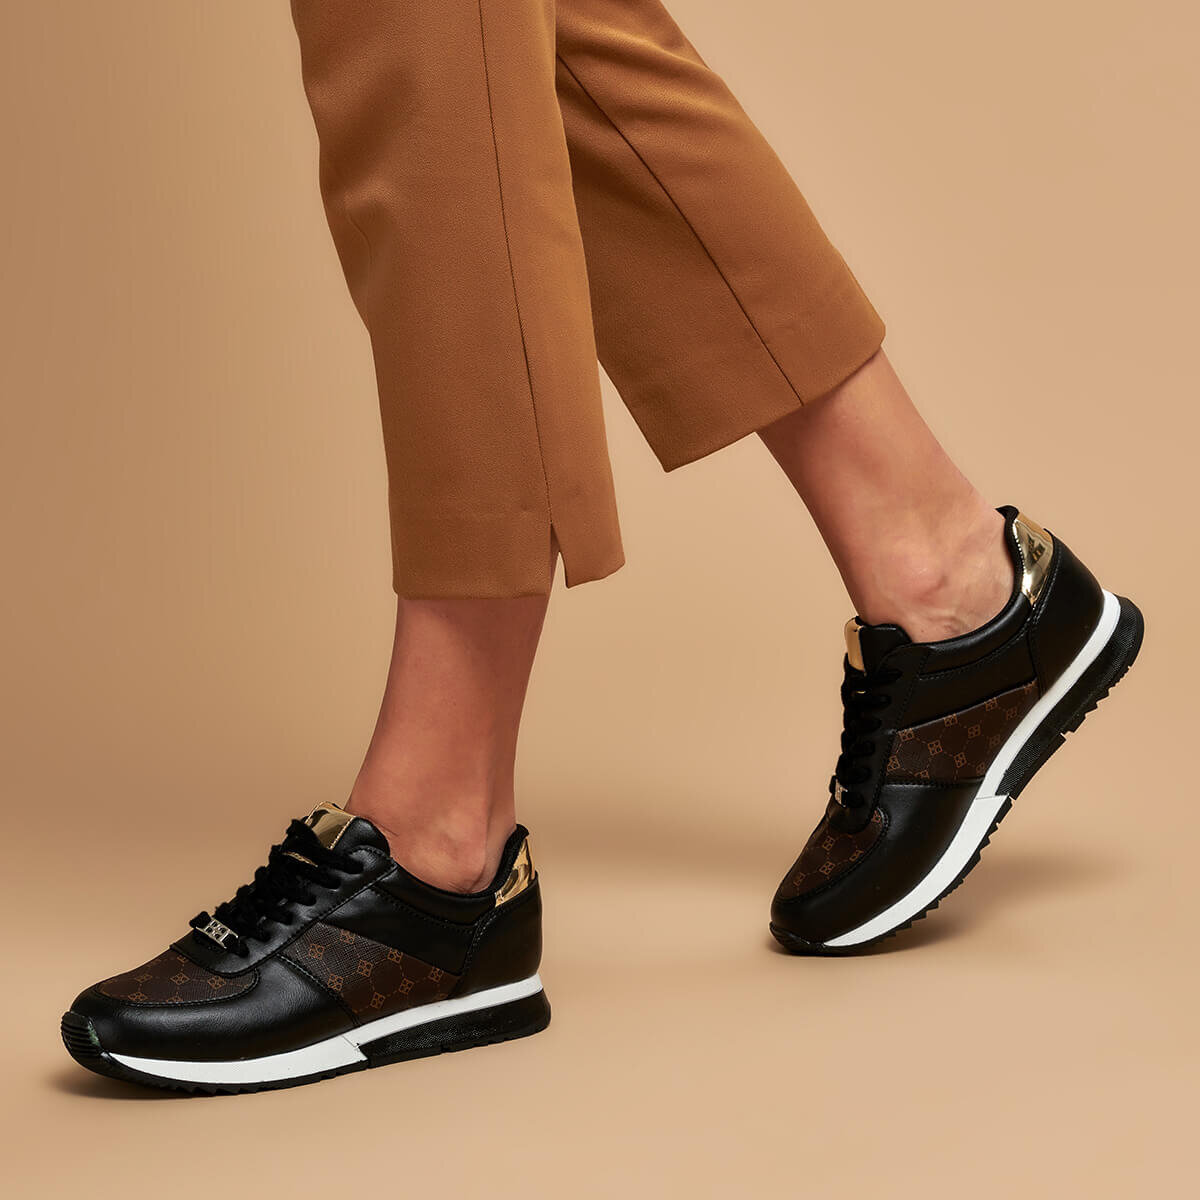 FLO S1116-6 Black Women 'S Sneaker Shoes BUTIGO